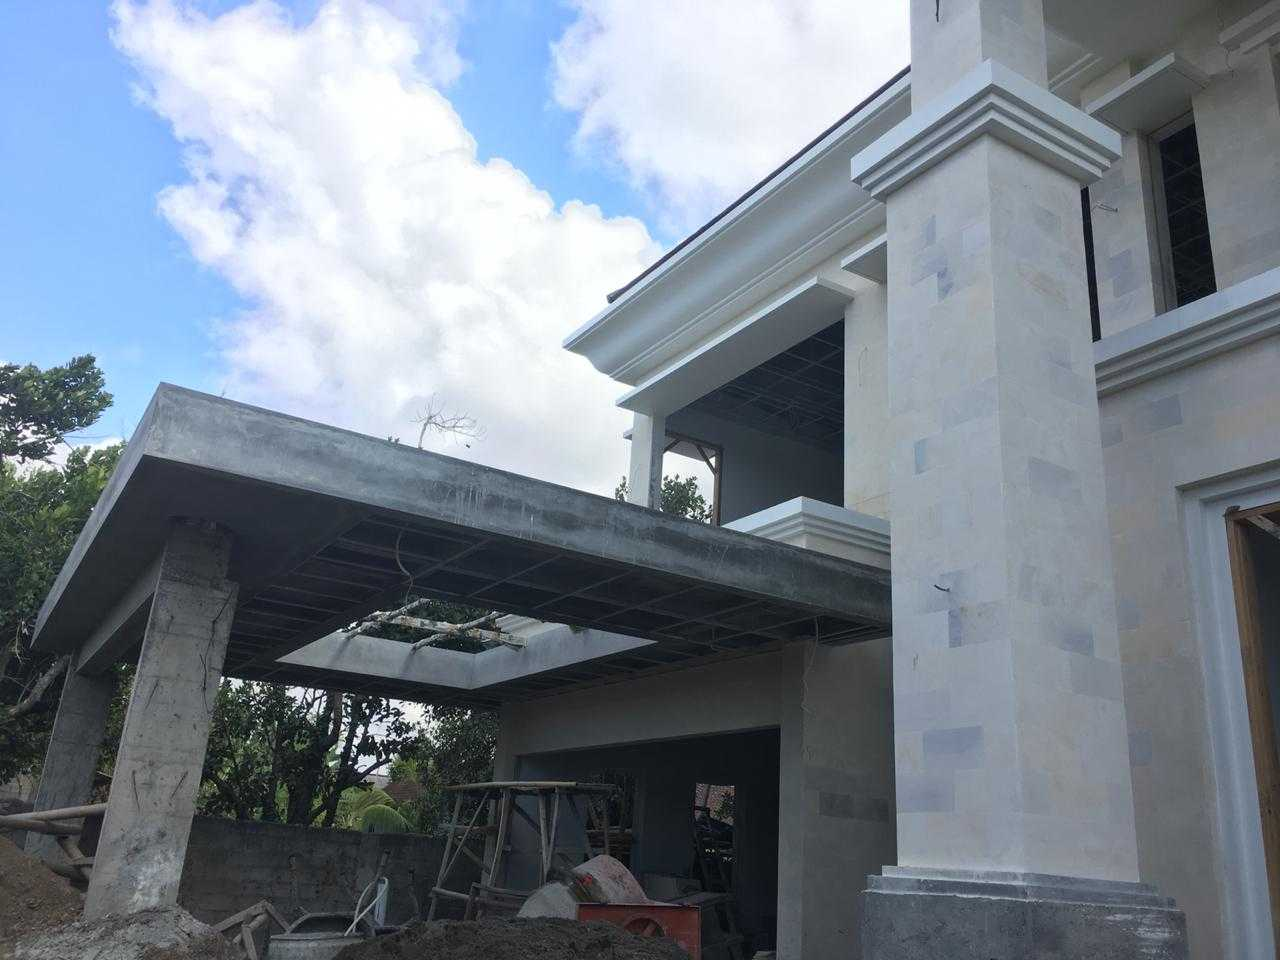 Emporio Architect In Progress Villa Bali Tropis 216  @ Denpasar Kota Denpasar, Bali, Indonesia Kota Denpasar, Bali, Indonesia Emporio-Architect-Progress-Villa-Bali-Tropis-216-Denpasar  75655